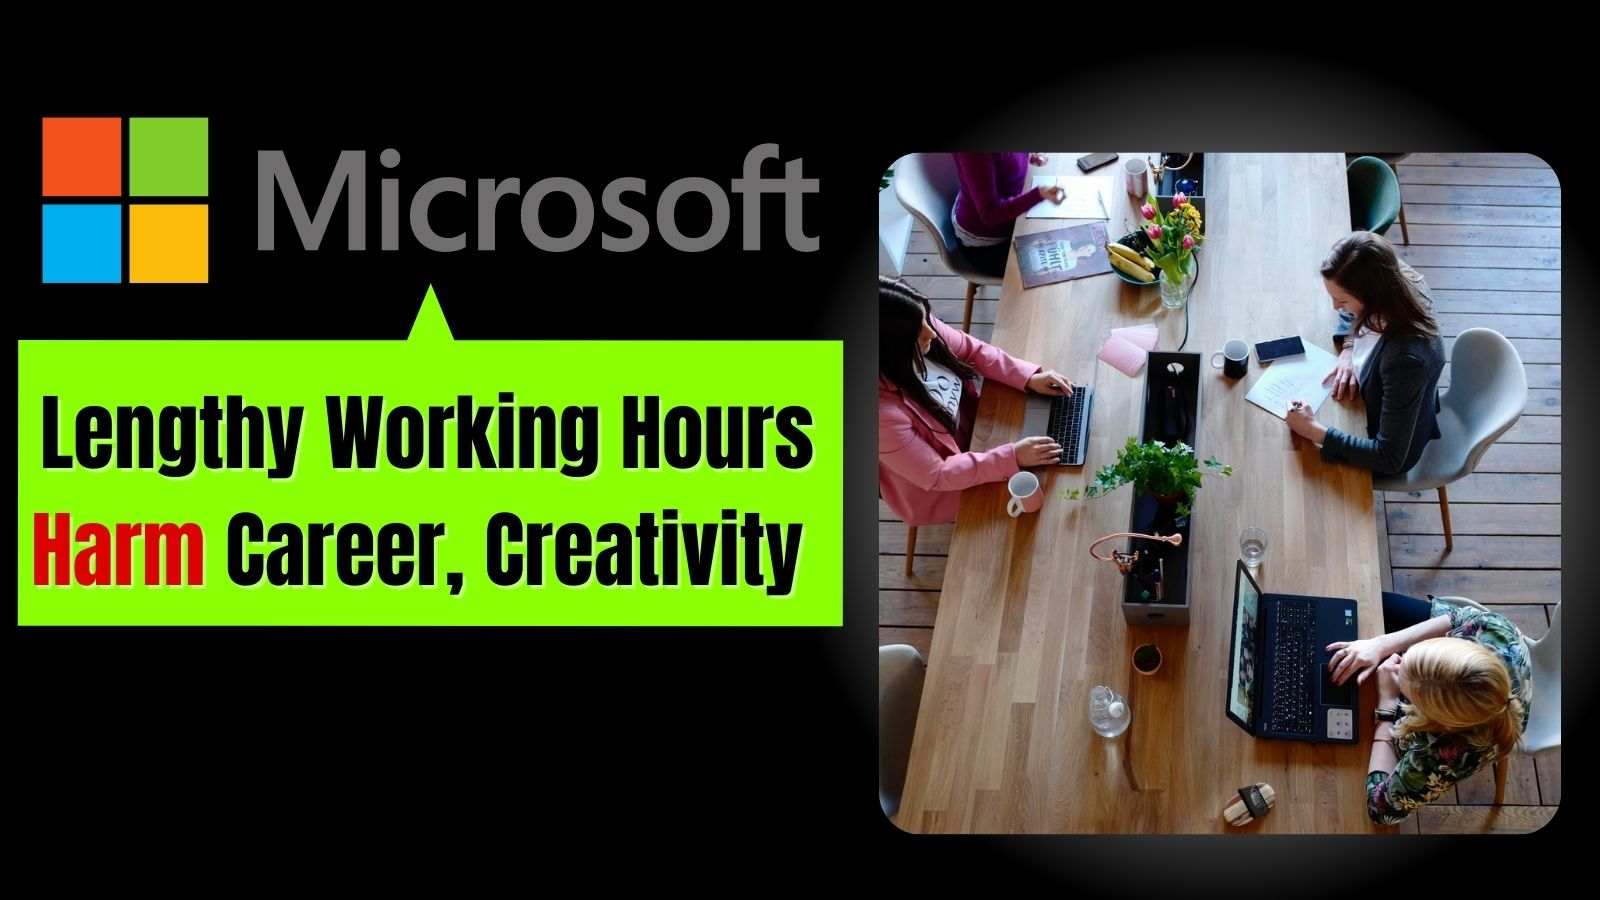 Microsoft Says Lengthy Working Hours Harm Careers